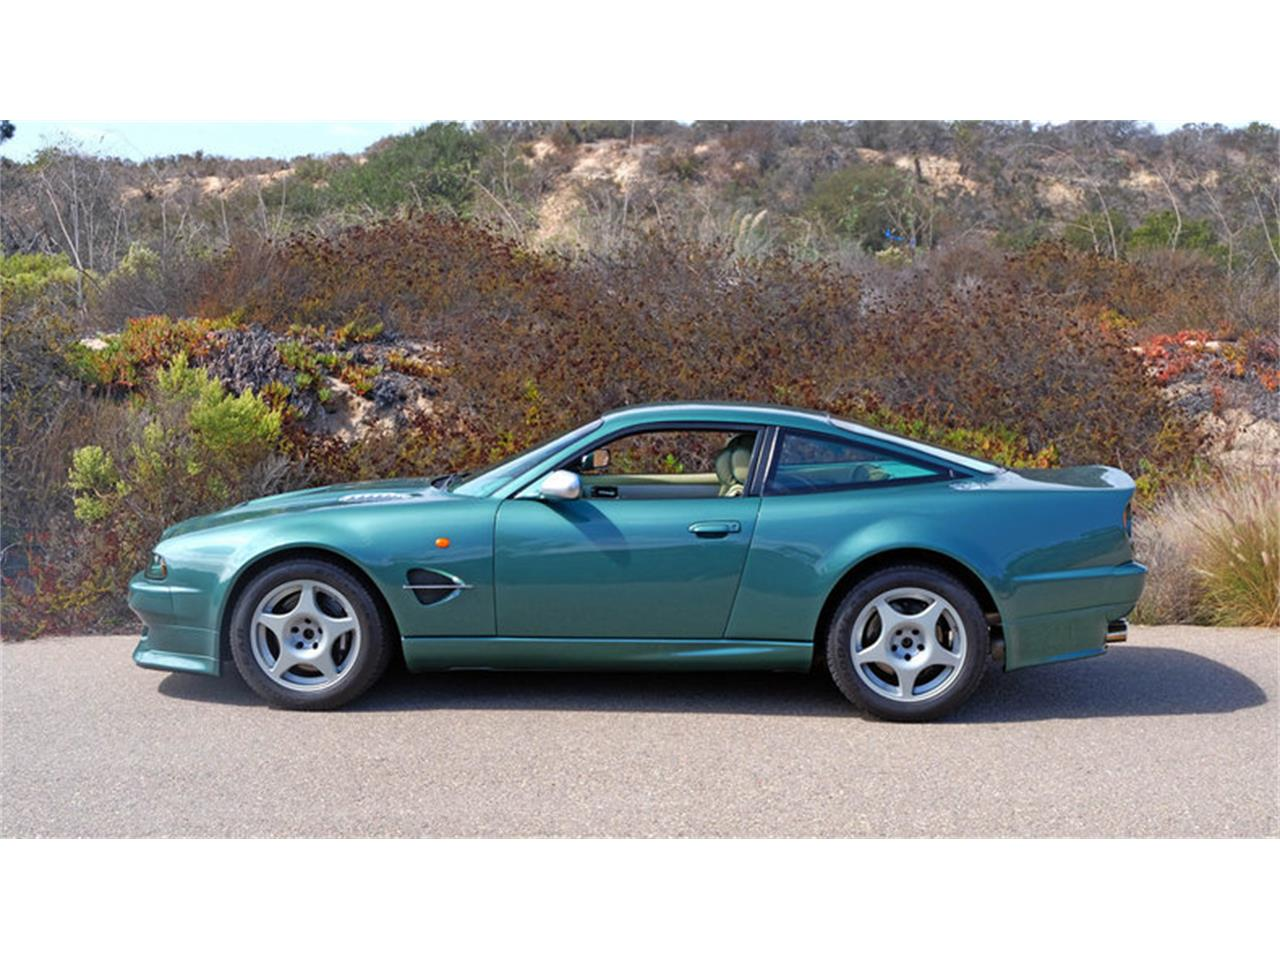 Aston Martin Vantage For Sale ClassicCarscom CC - Aston martin for sale san diego